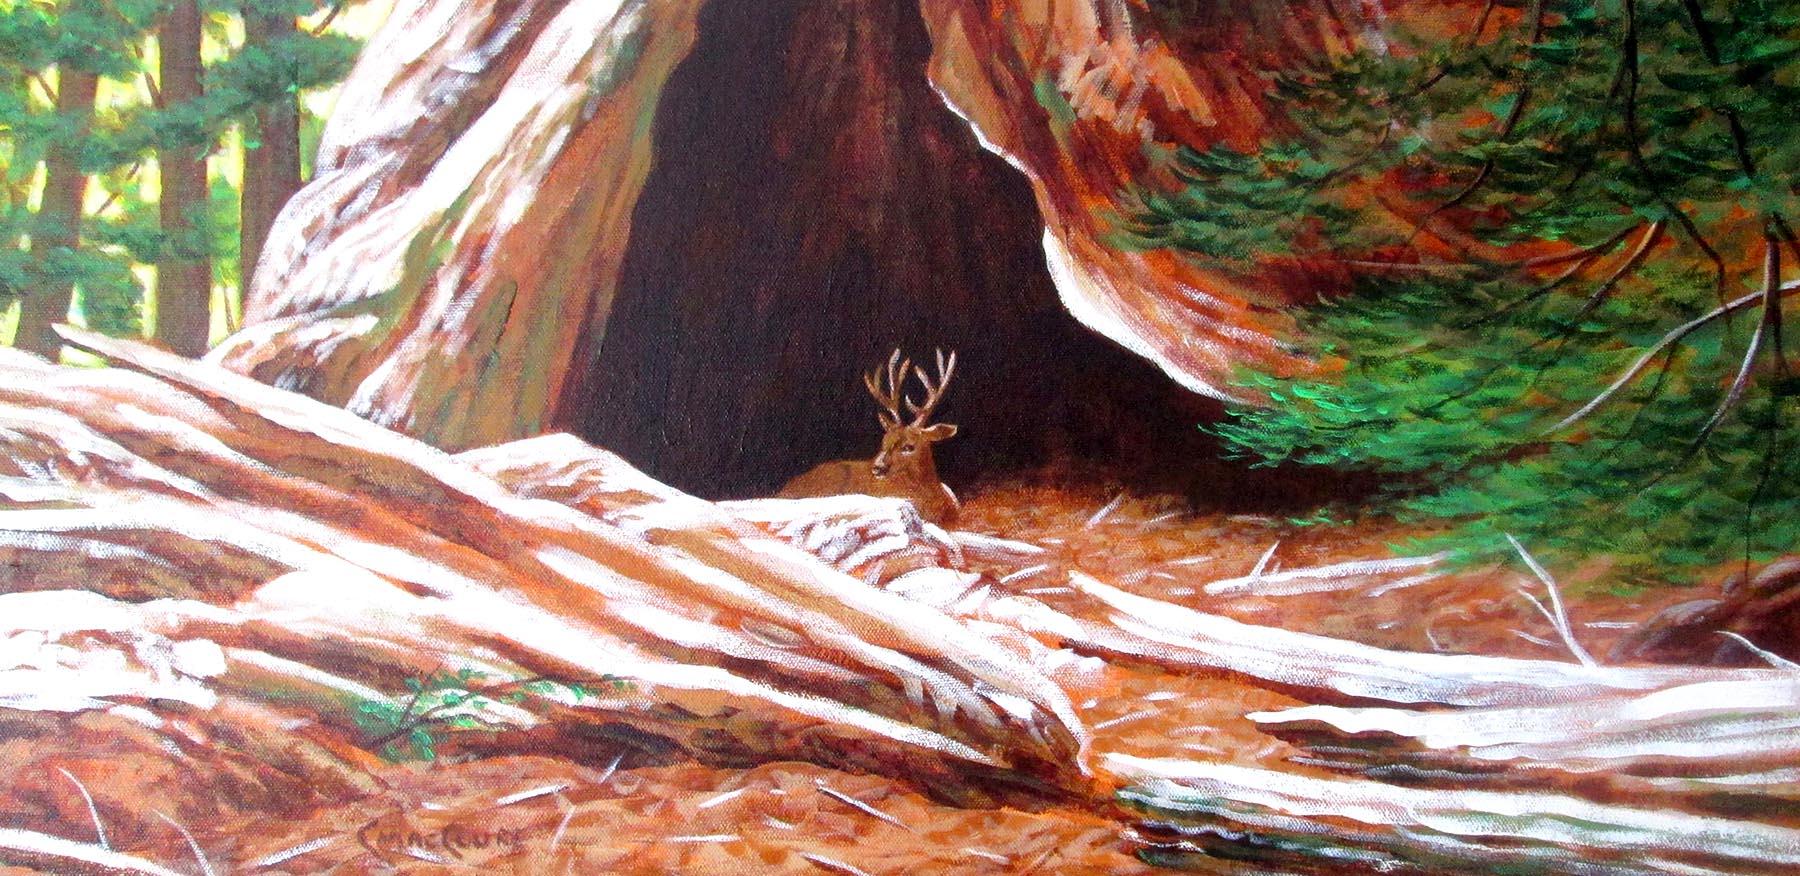 Nature's Hobbit - Chris MacClure